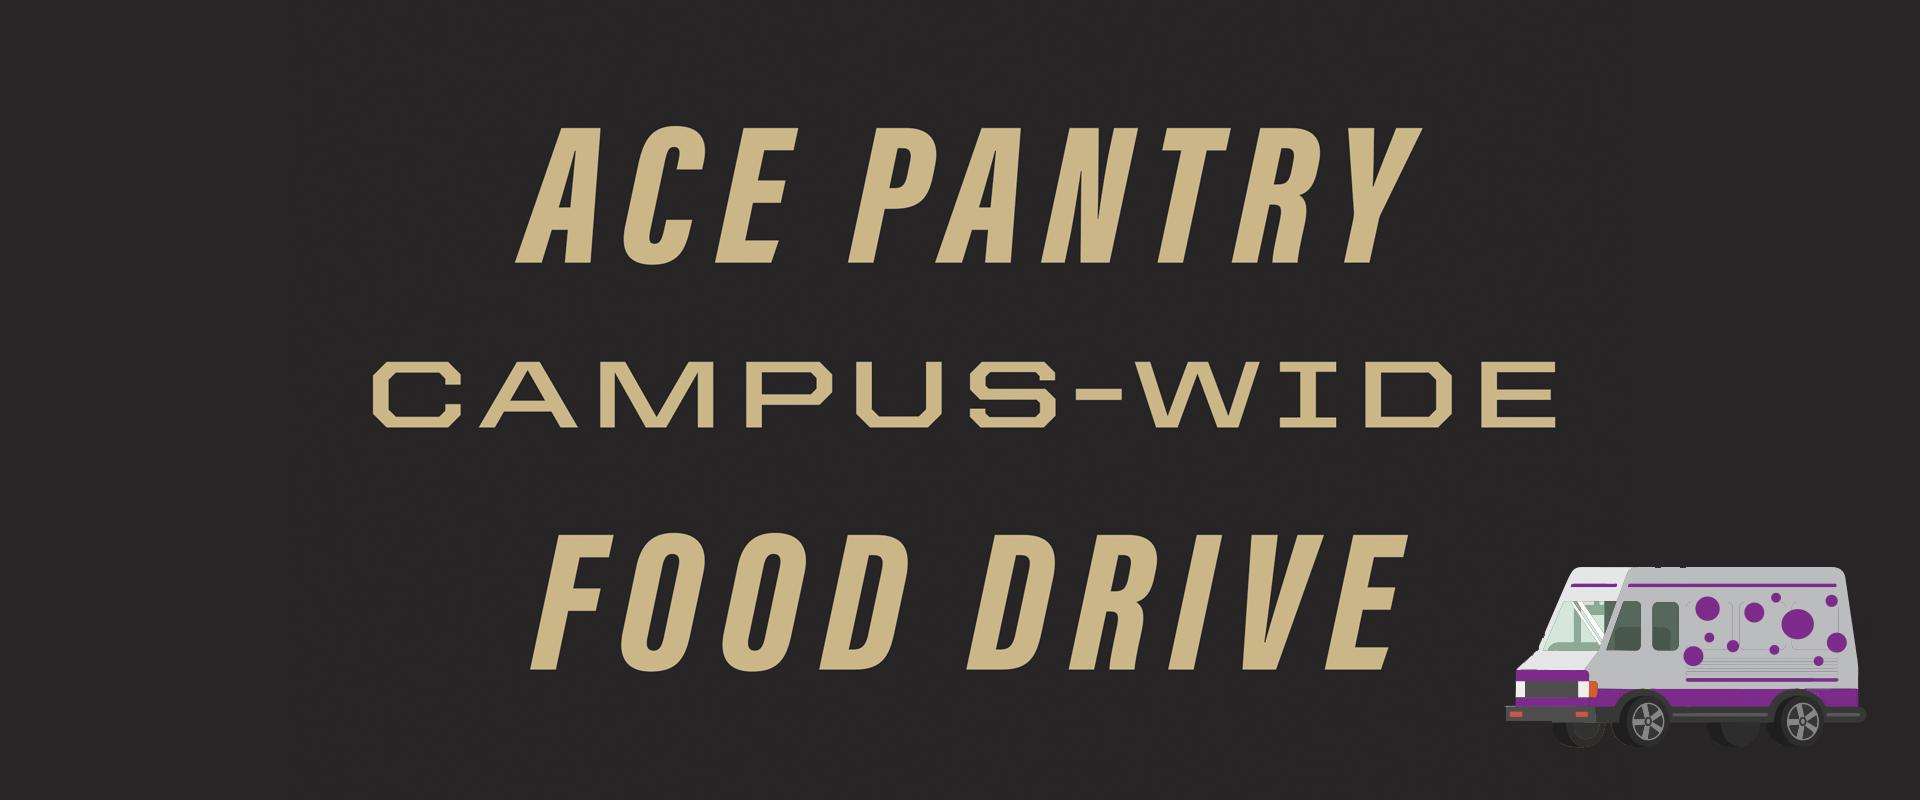 ACE food drive